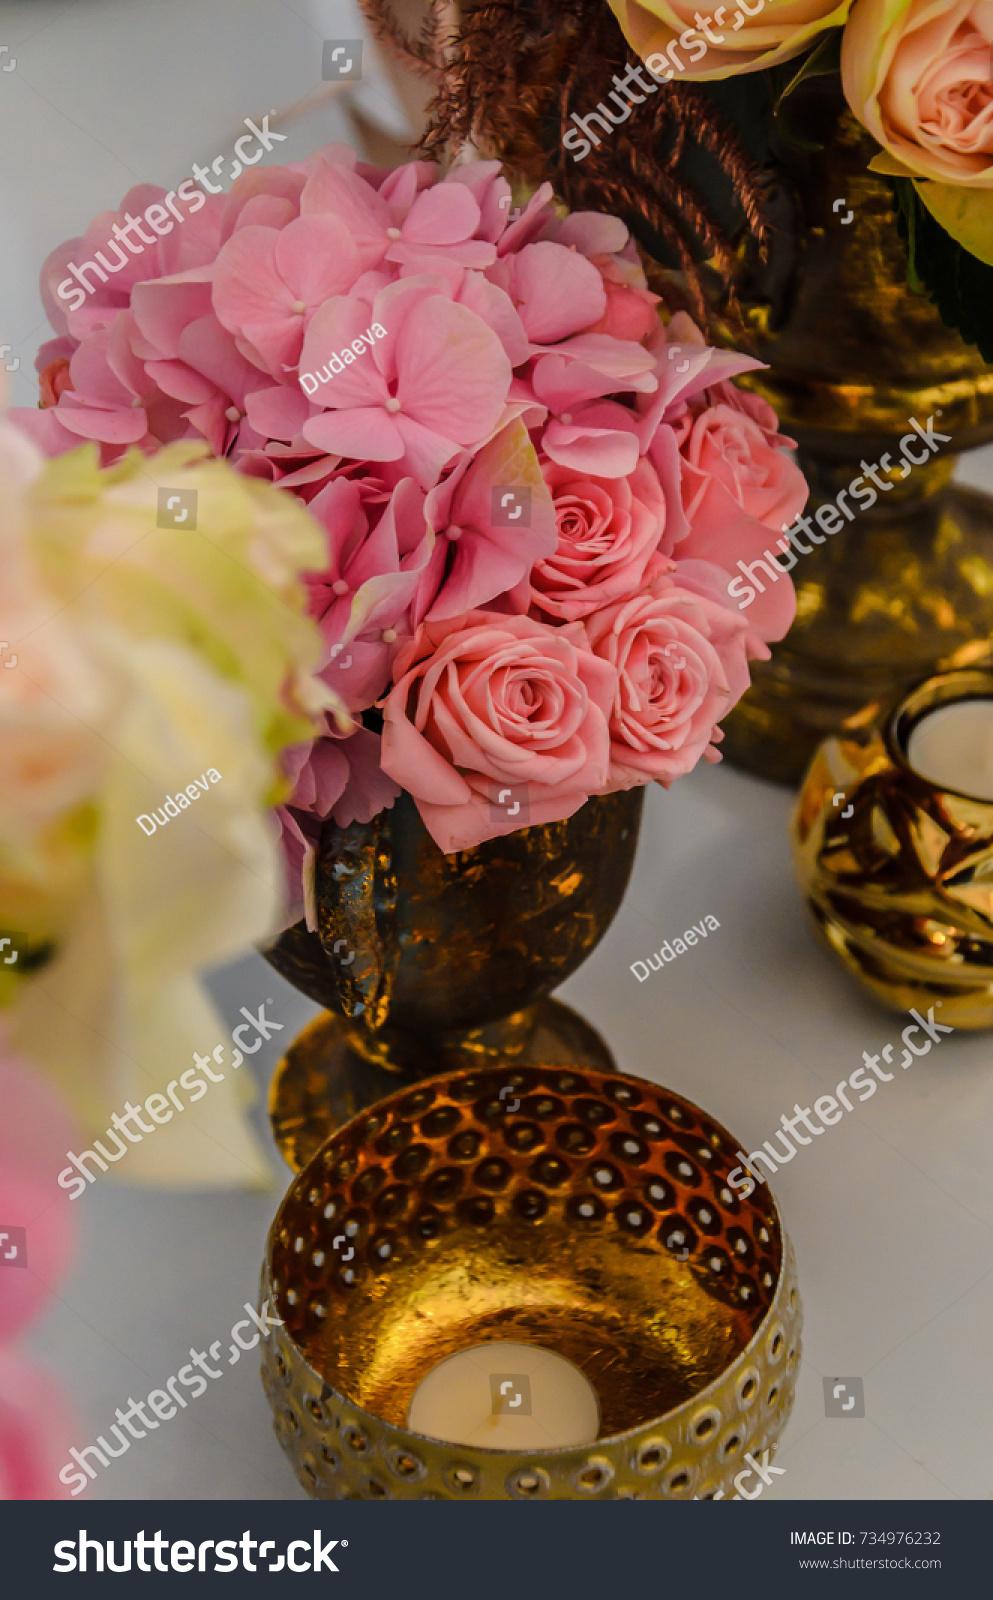 Delicate Bouquet Hydrangea Flowers Roses Antique Stock Photo Edit Now 734976232